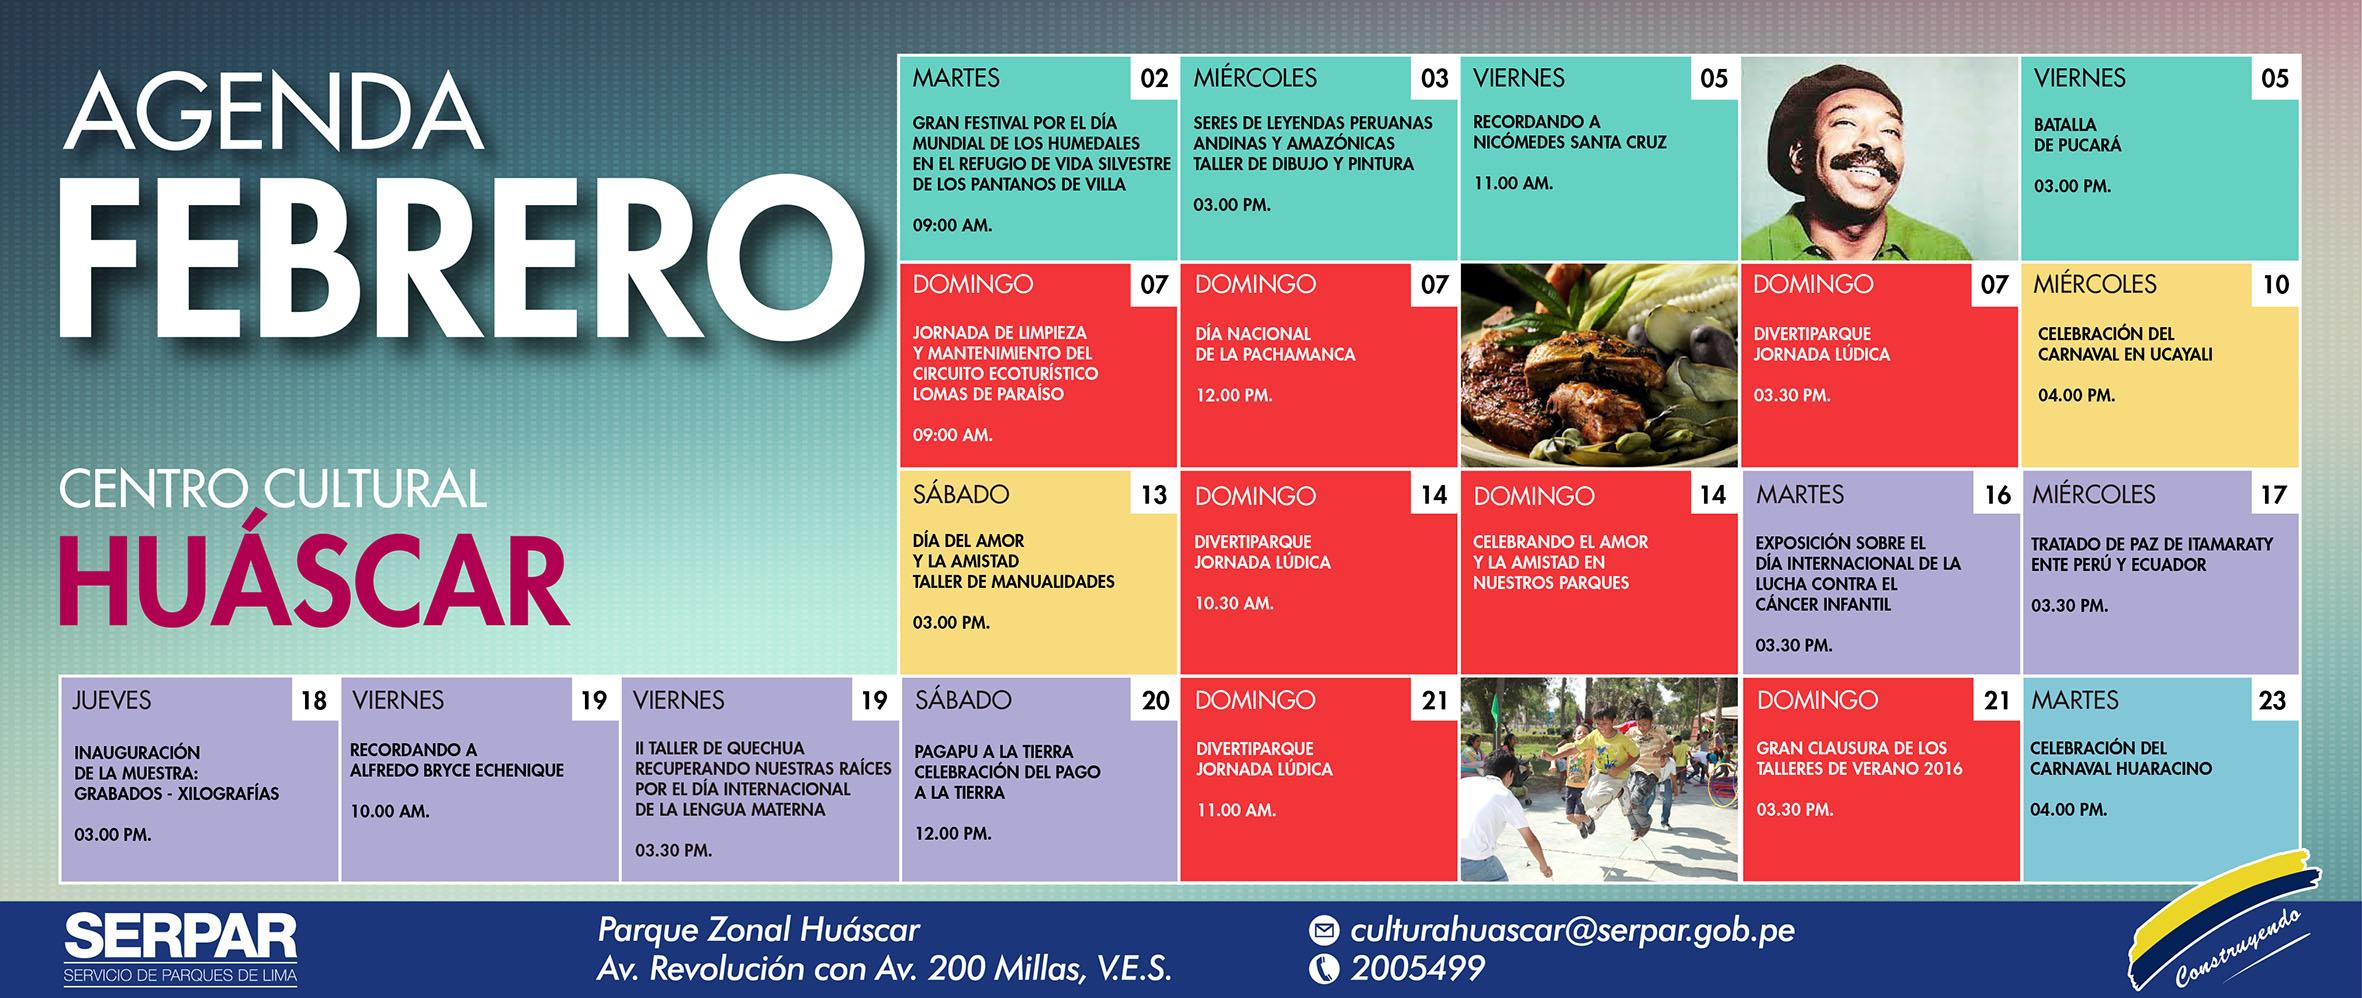 web_agenda_cultura_FEBRERO-02